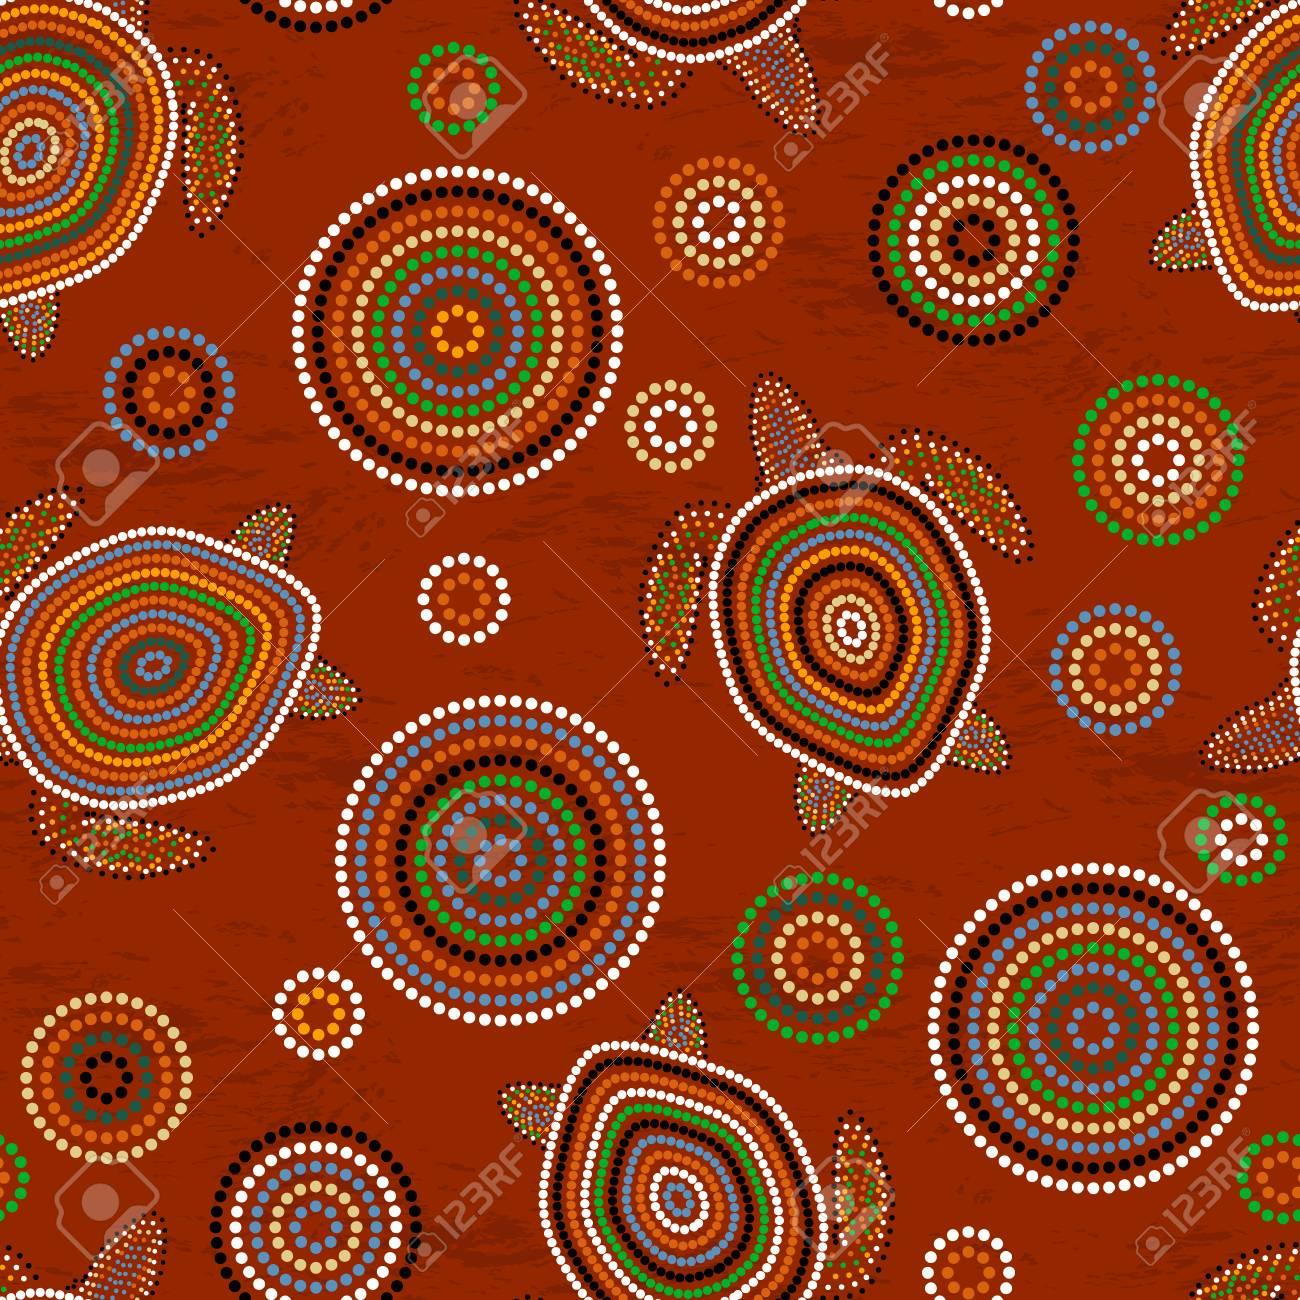 Australian Aboriginal Art Point Drawing Sea Turtles Seamless